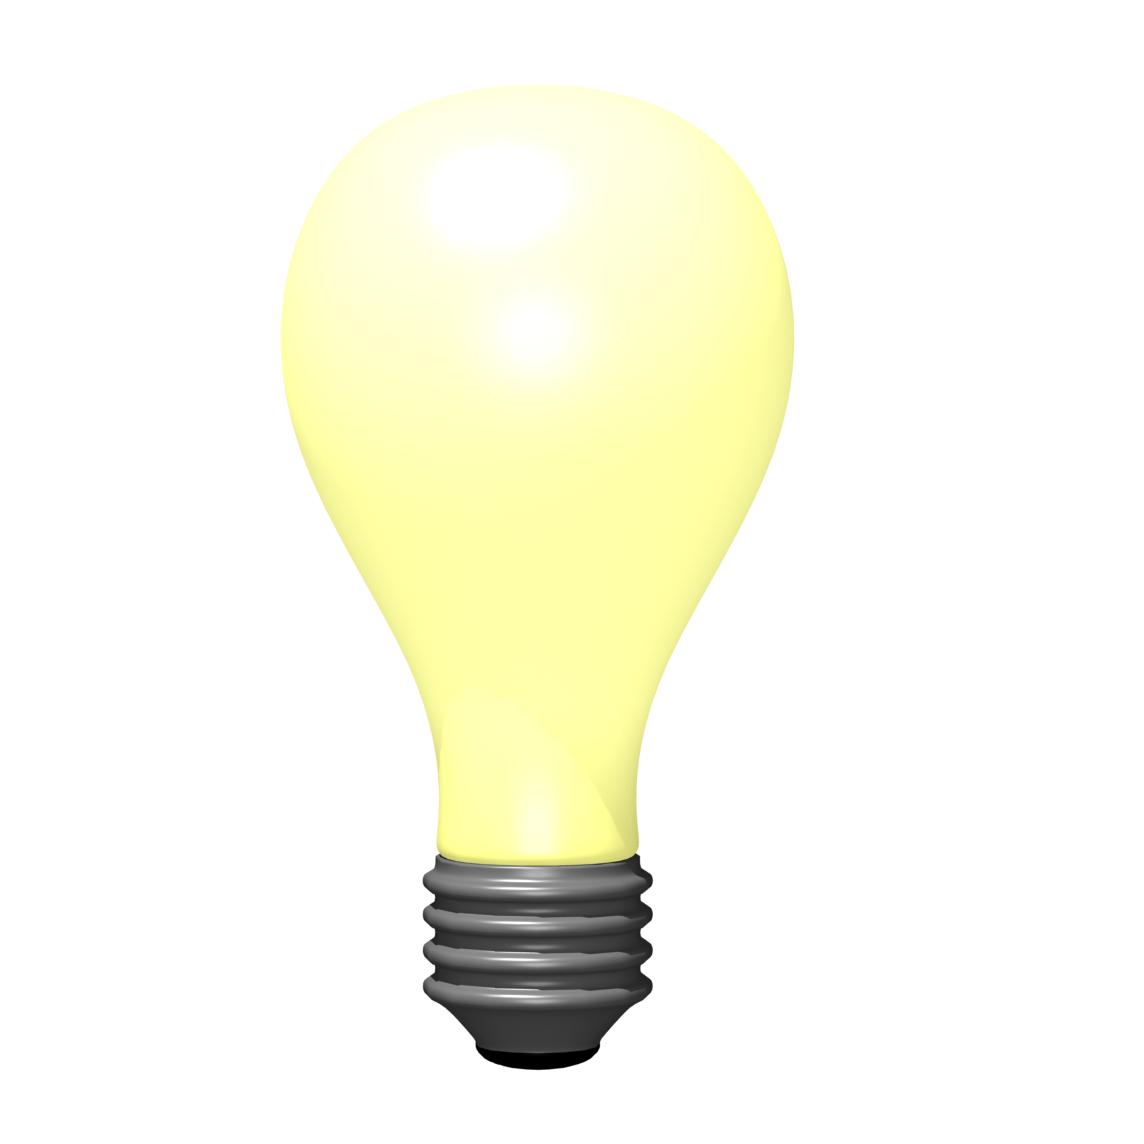 Lamp clipart bilb. Bulb png image purepng